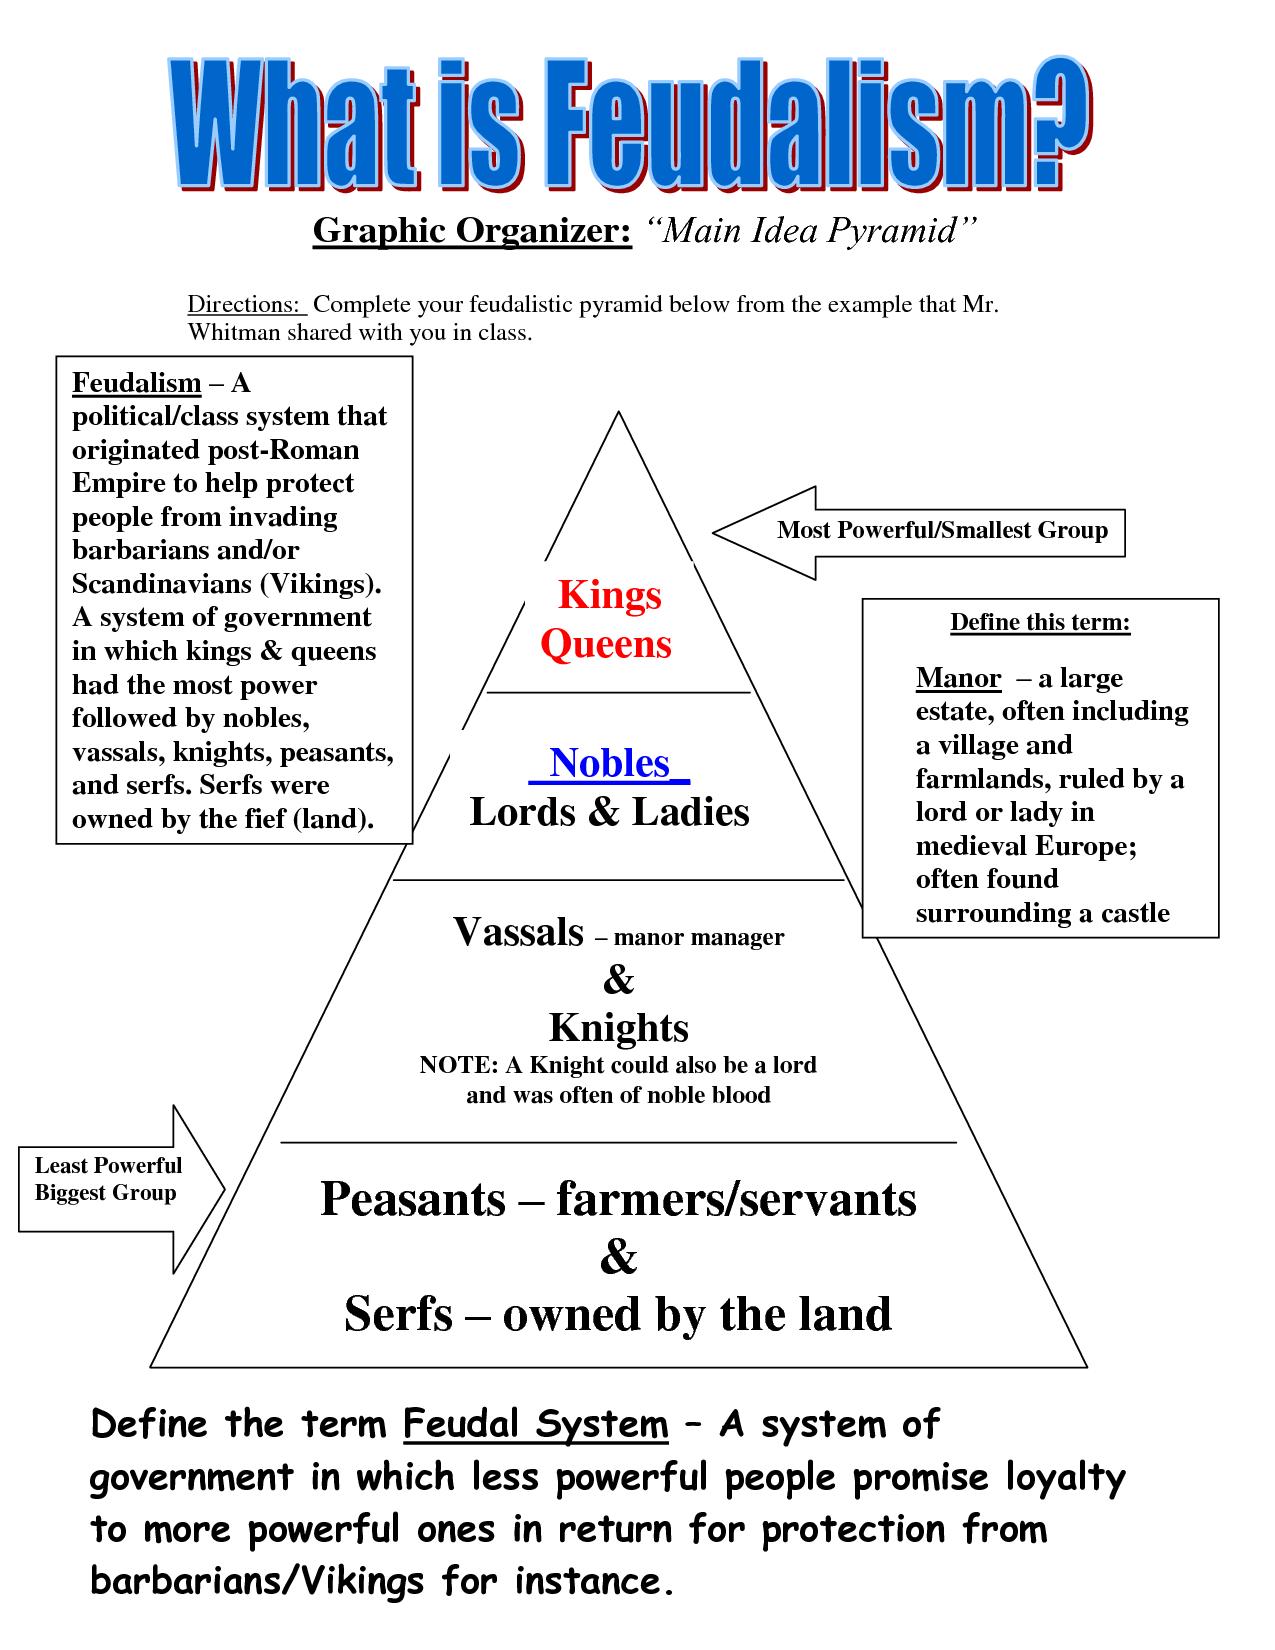 medium resolution of what is feudalism graphic organizer